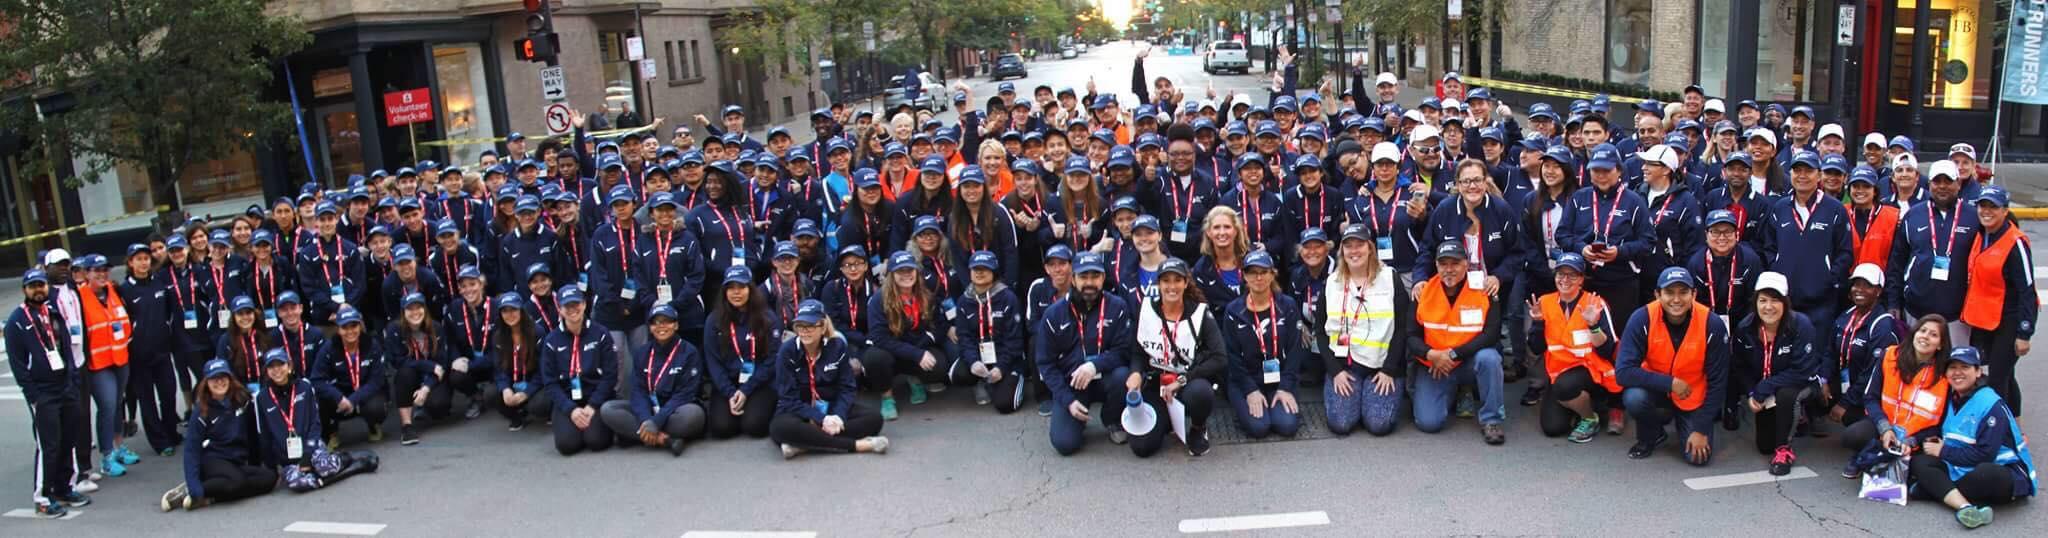 Aid Station 09 -Chicago Marathon 2019